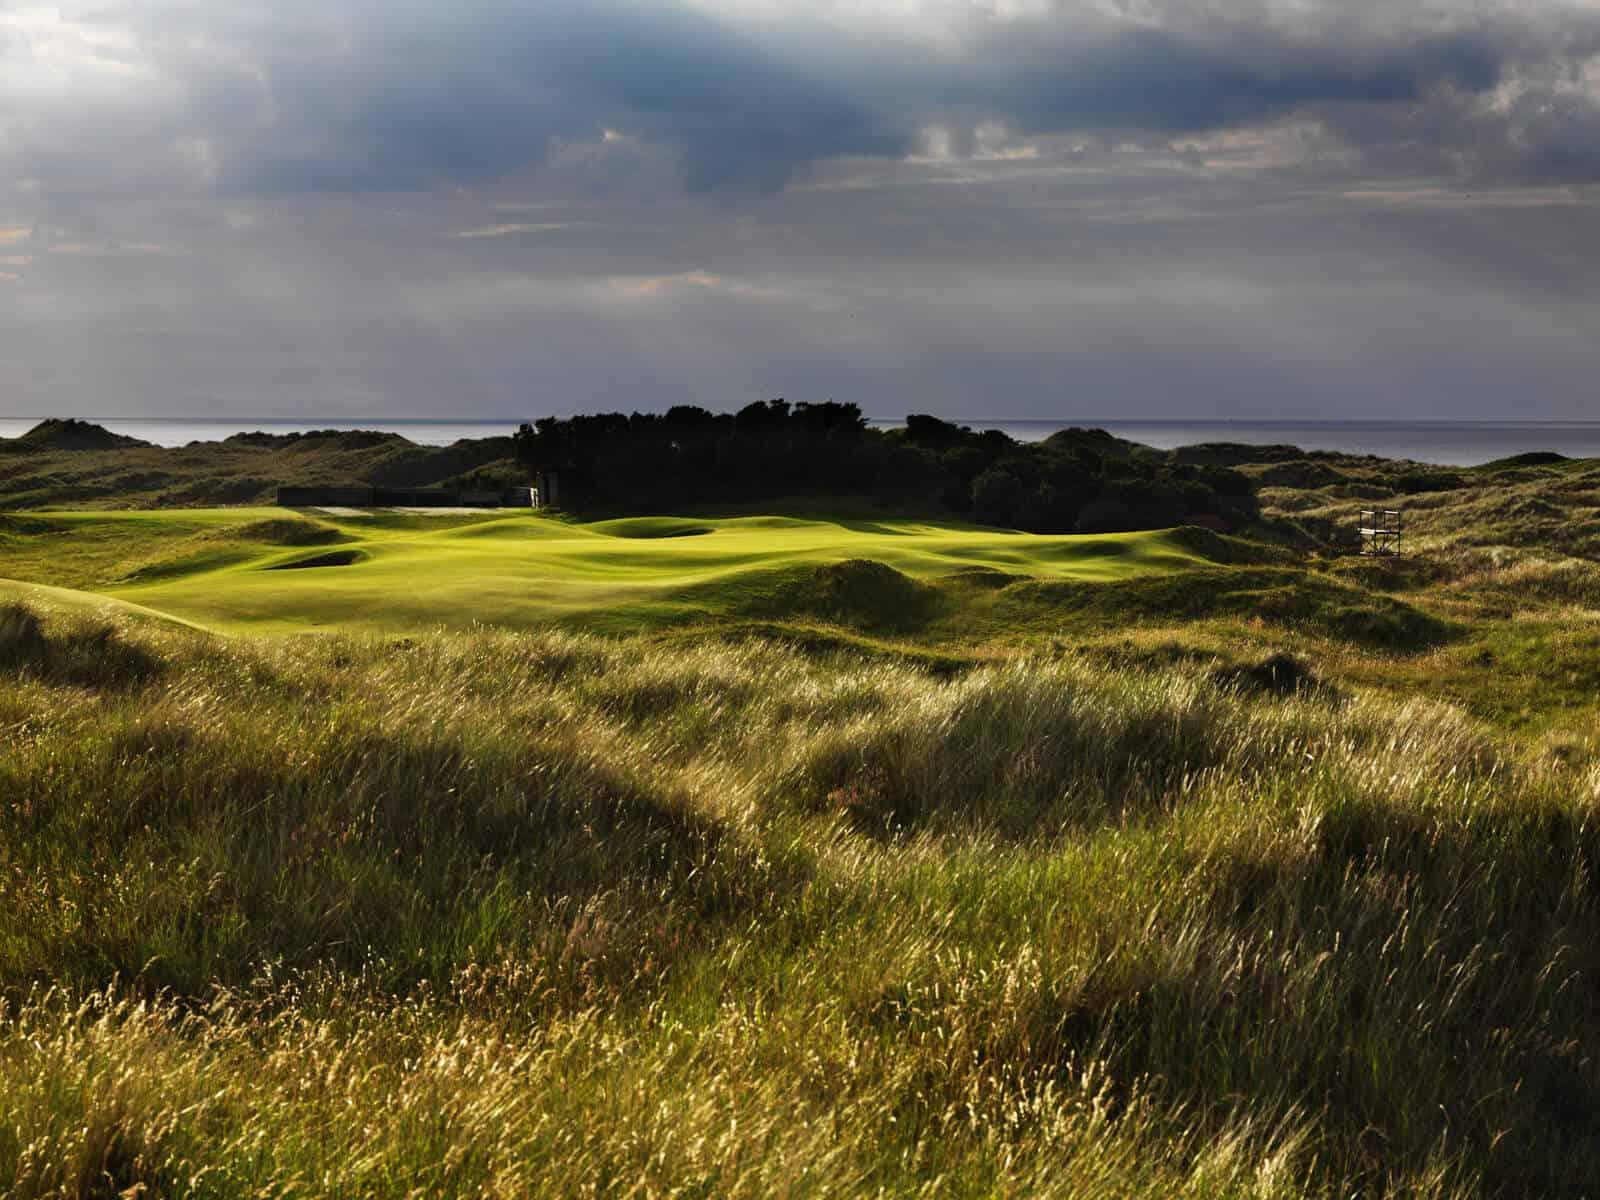 Royal Portrush Golf Club, 13th Hole, Skerries, Northern Ireland